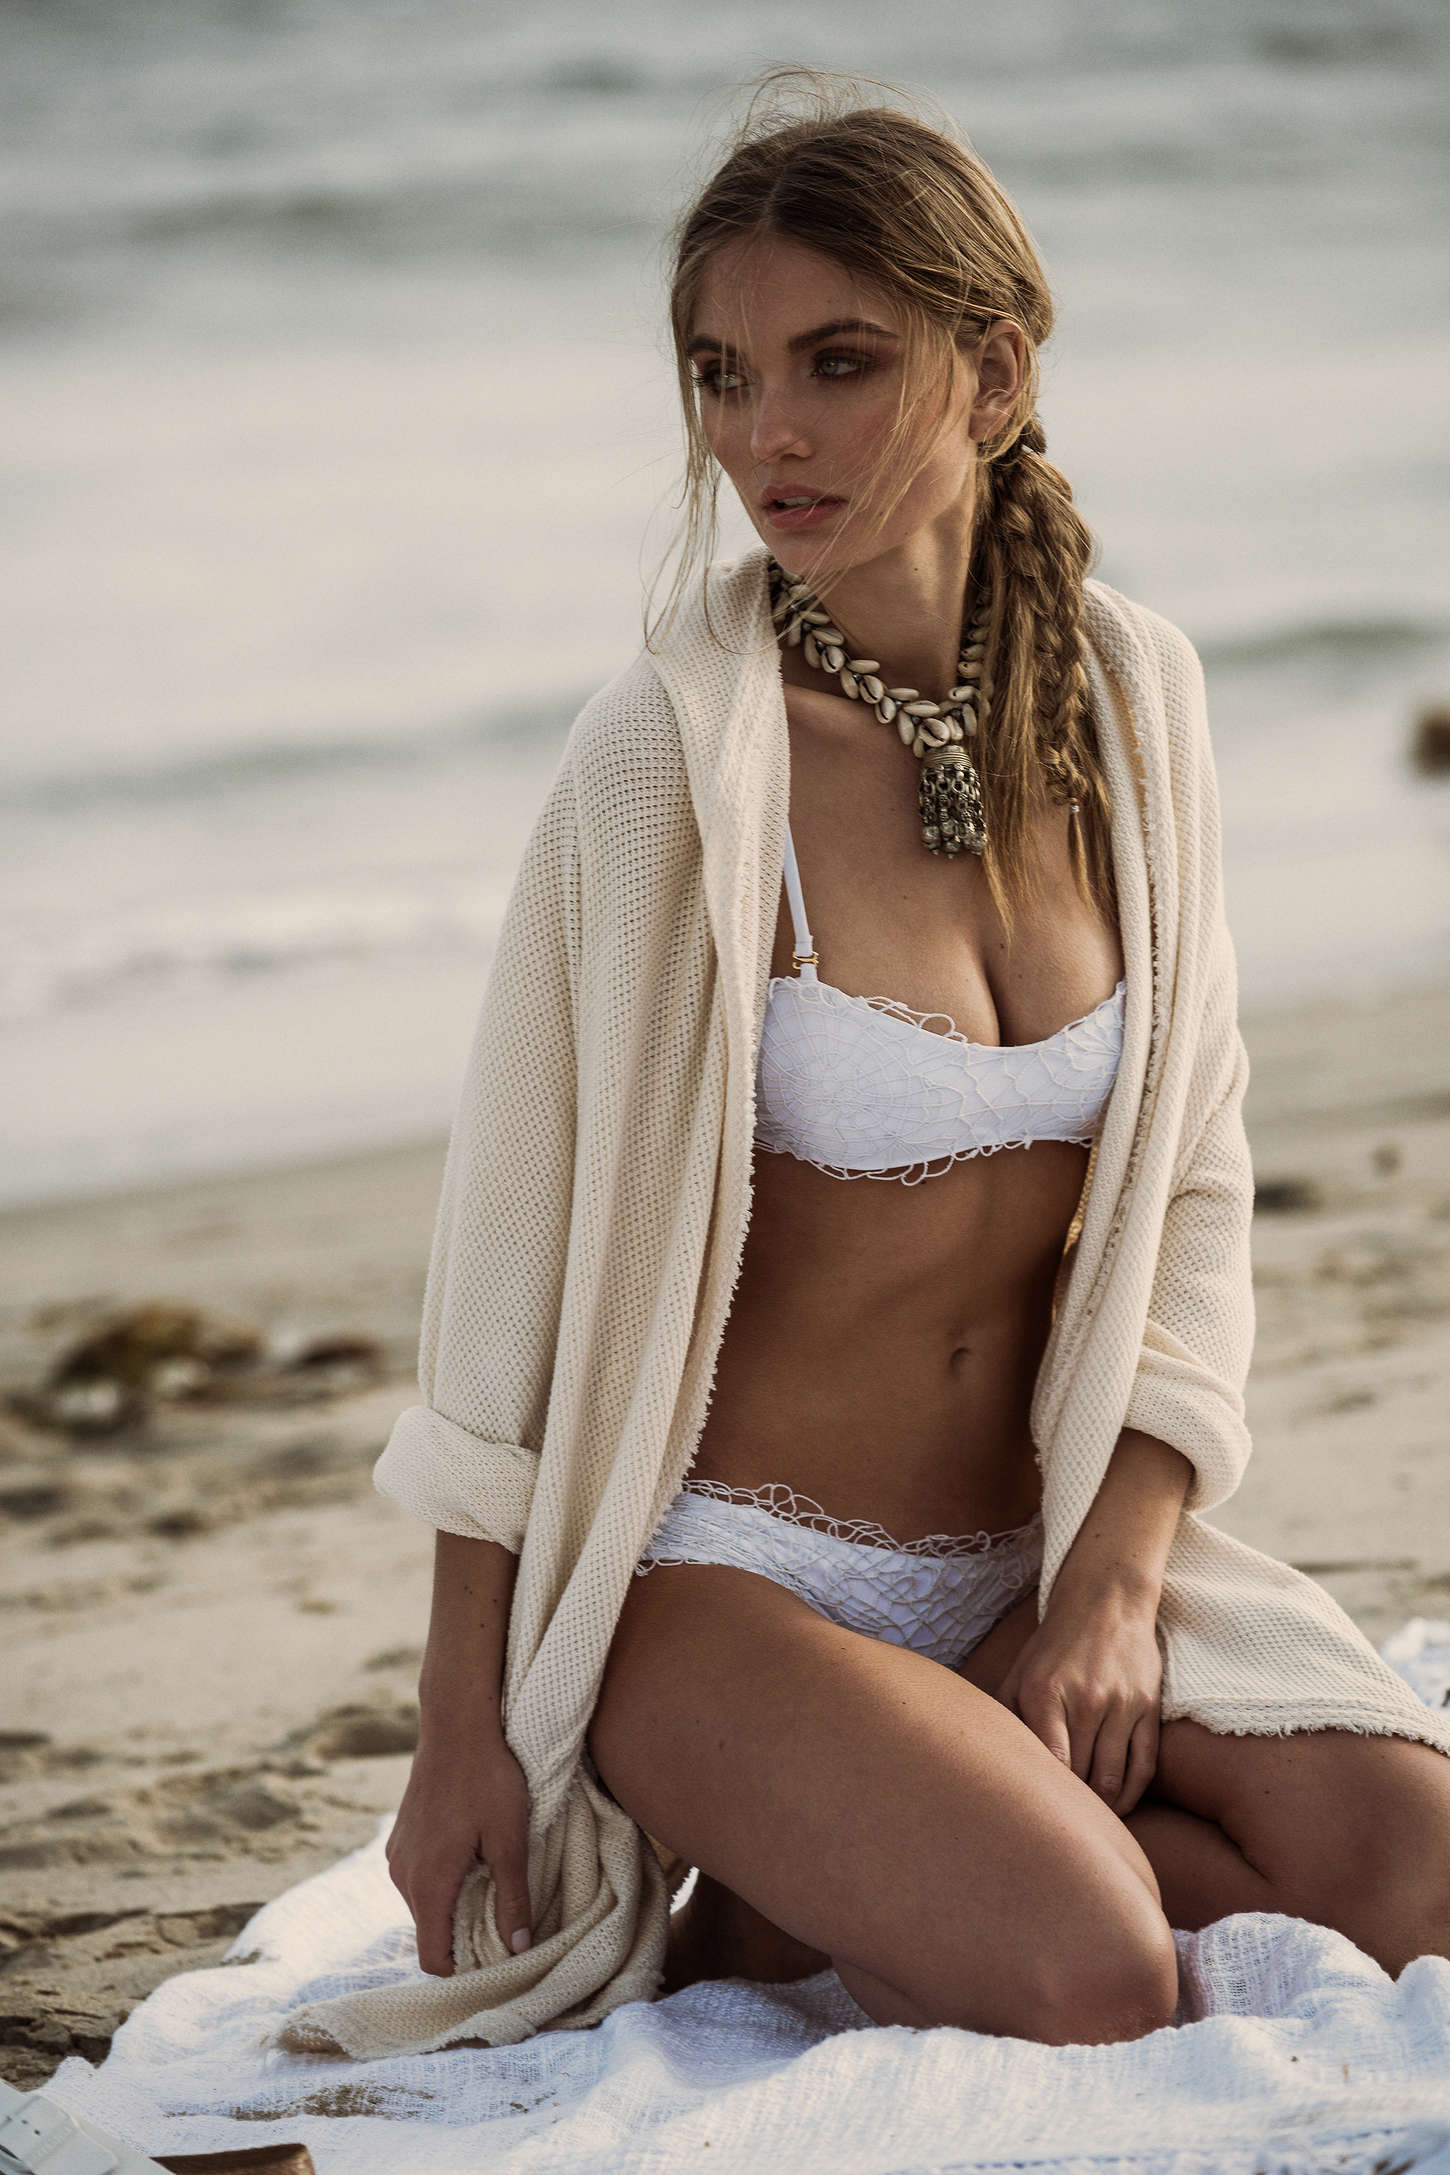 Photos Natalie Morris nude (99 foto and video), Sexy, Bikini, Boobs, butt 2020